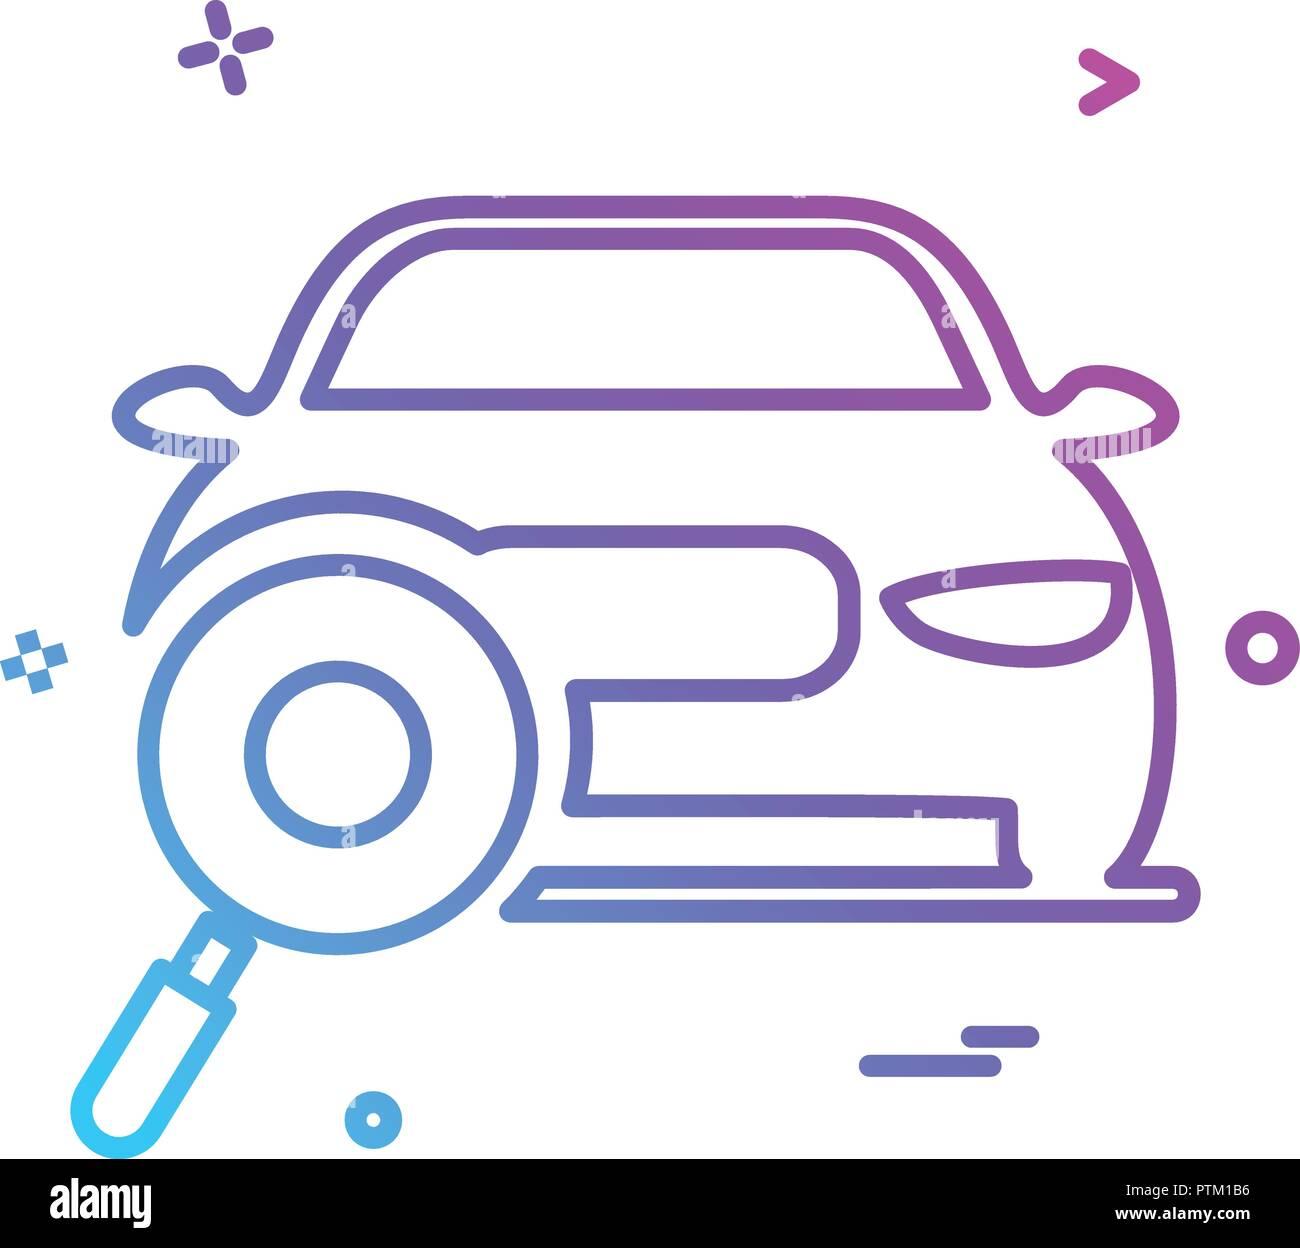 Auto Workshop Suche Auto Symbol Vektor Design Vektor Abbildung